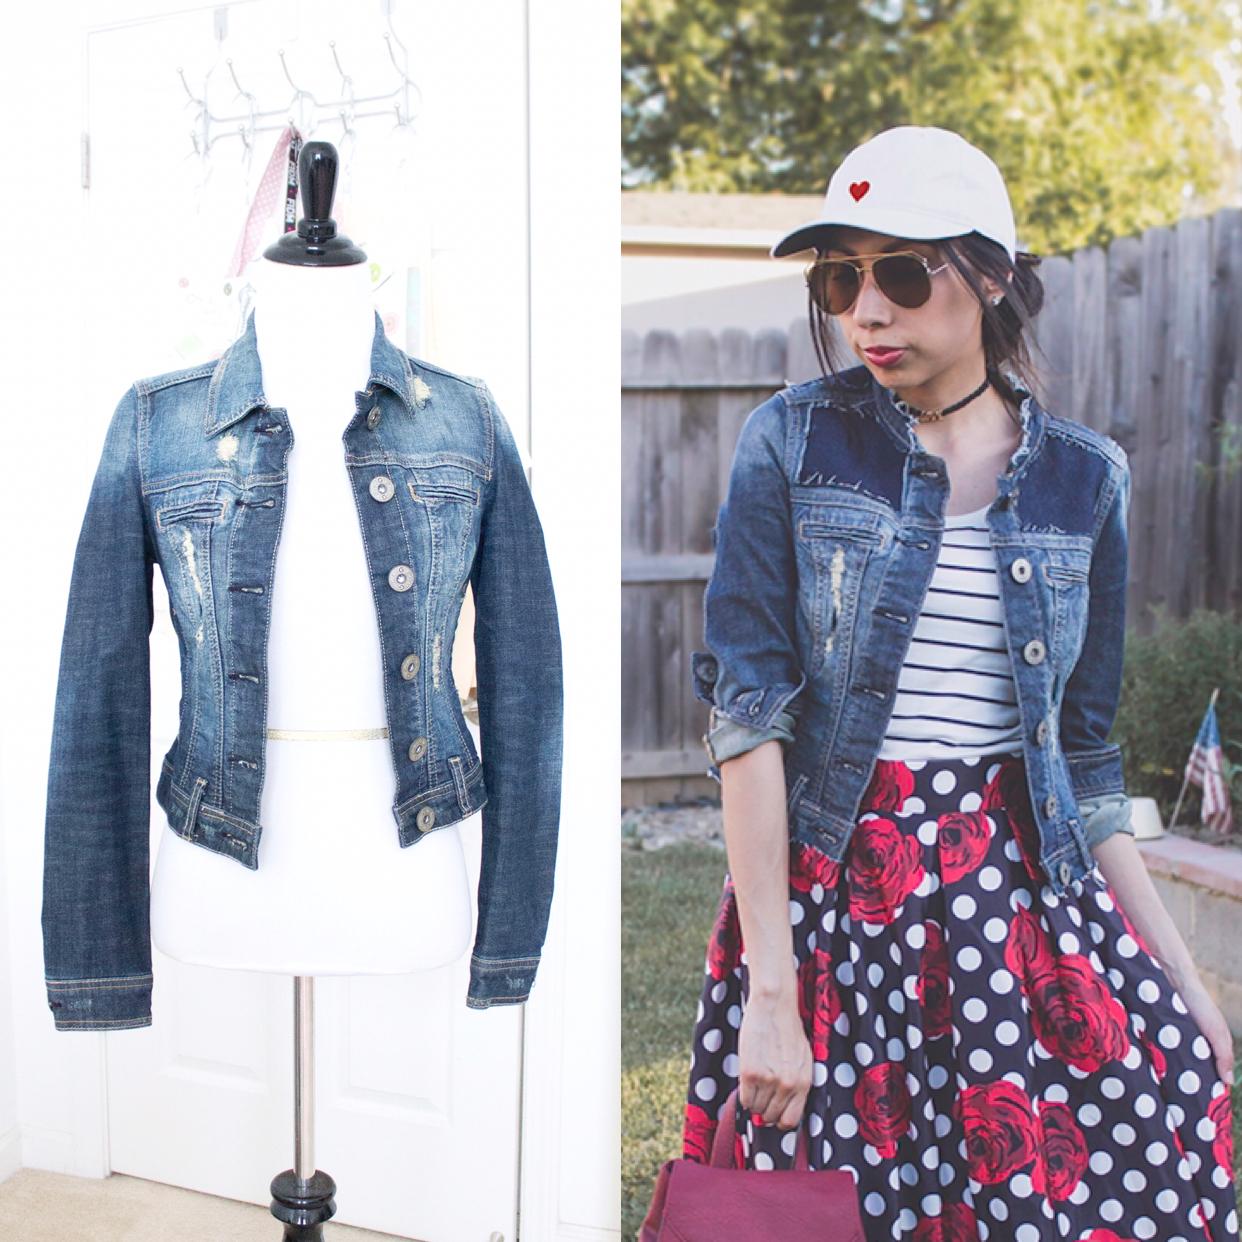 jean jacket refashion idea